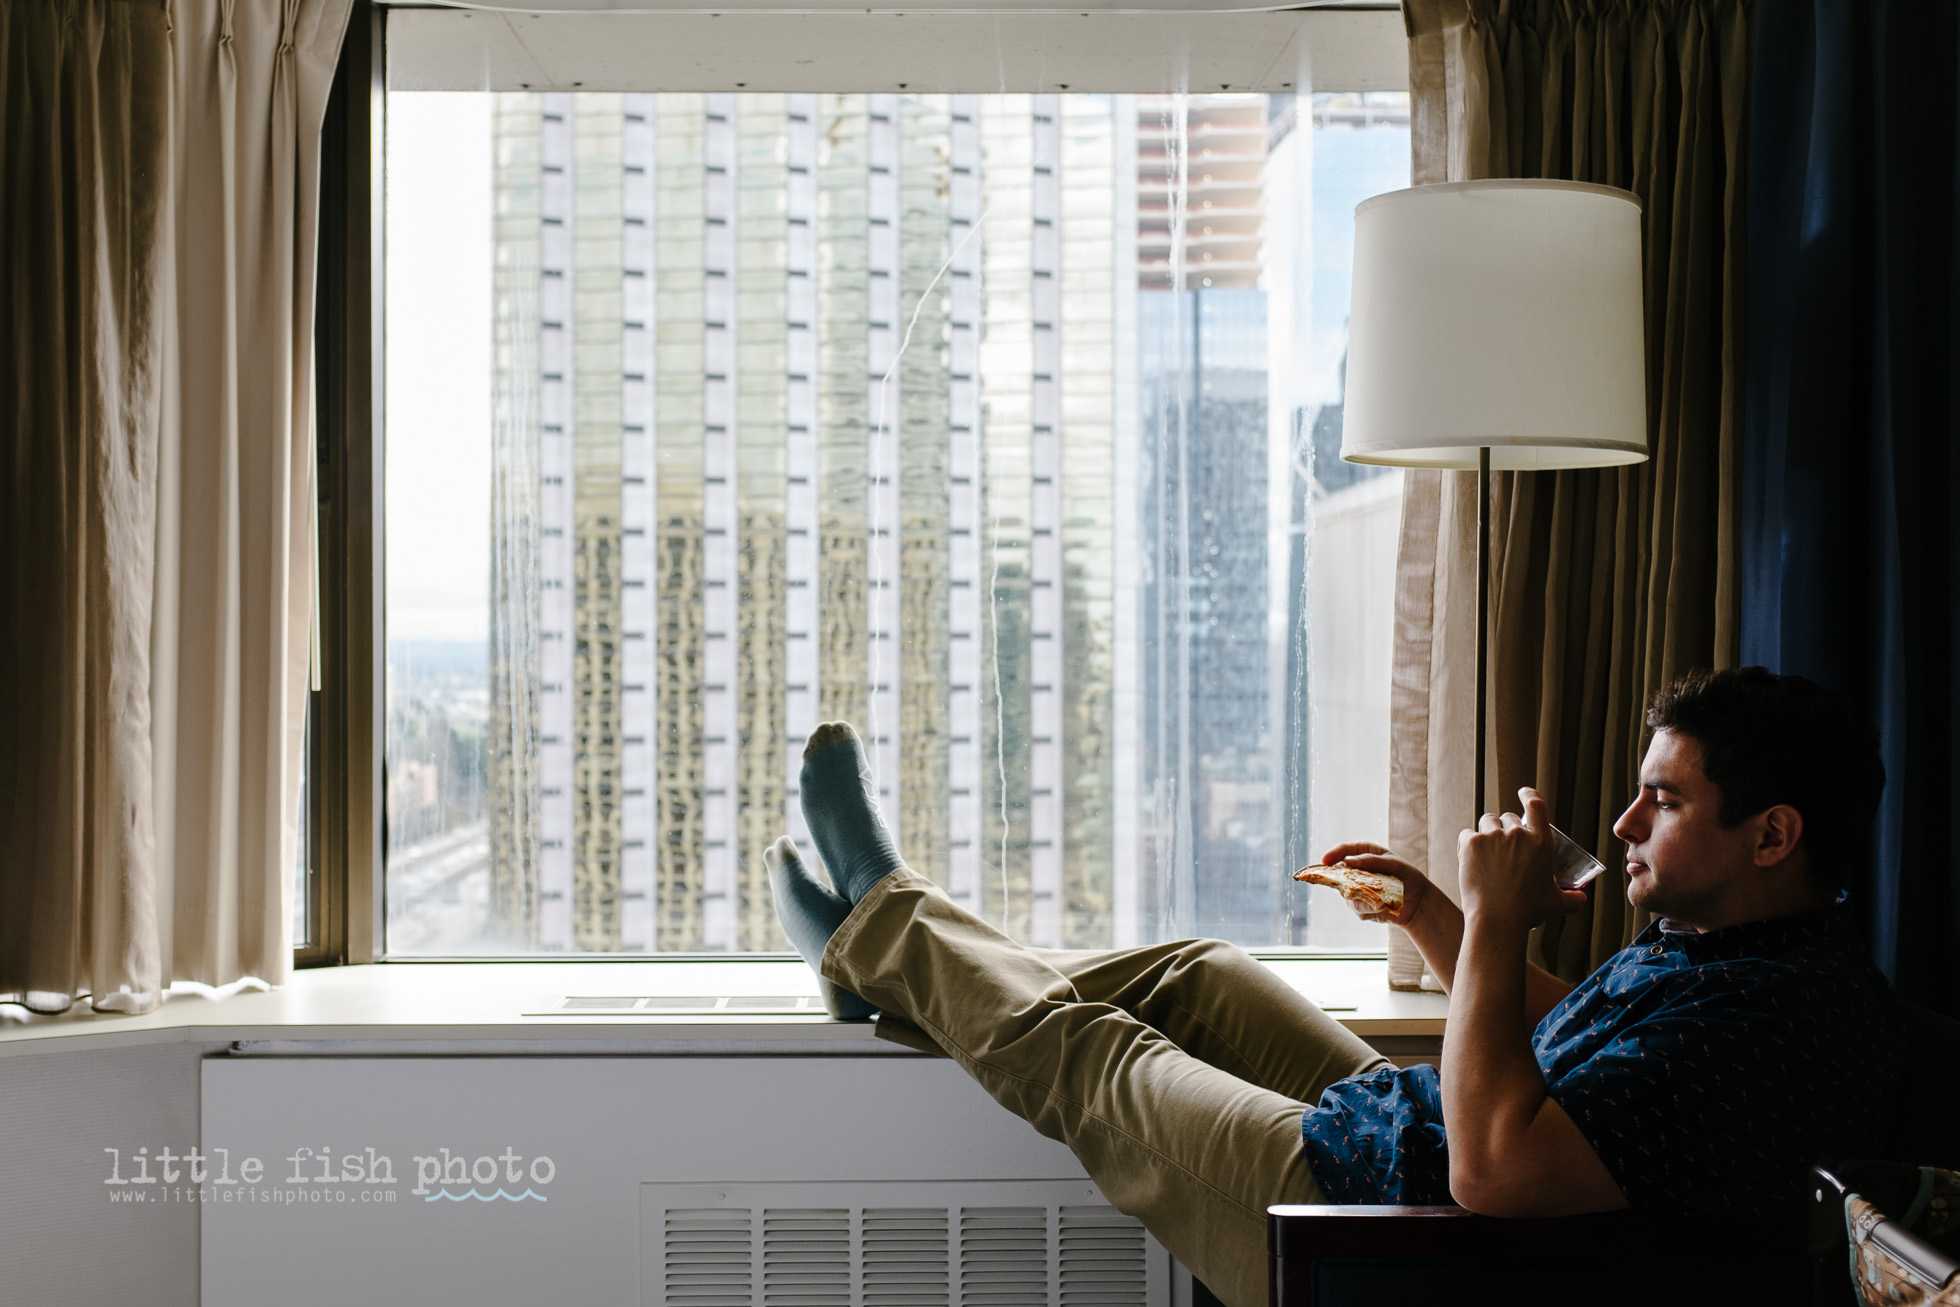 The 28th Floor - Erika Roa, Little Fish Photo